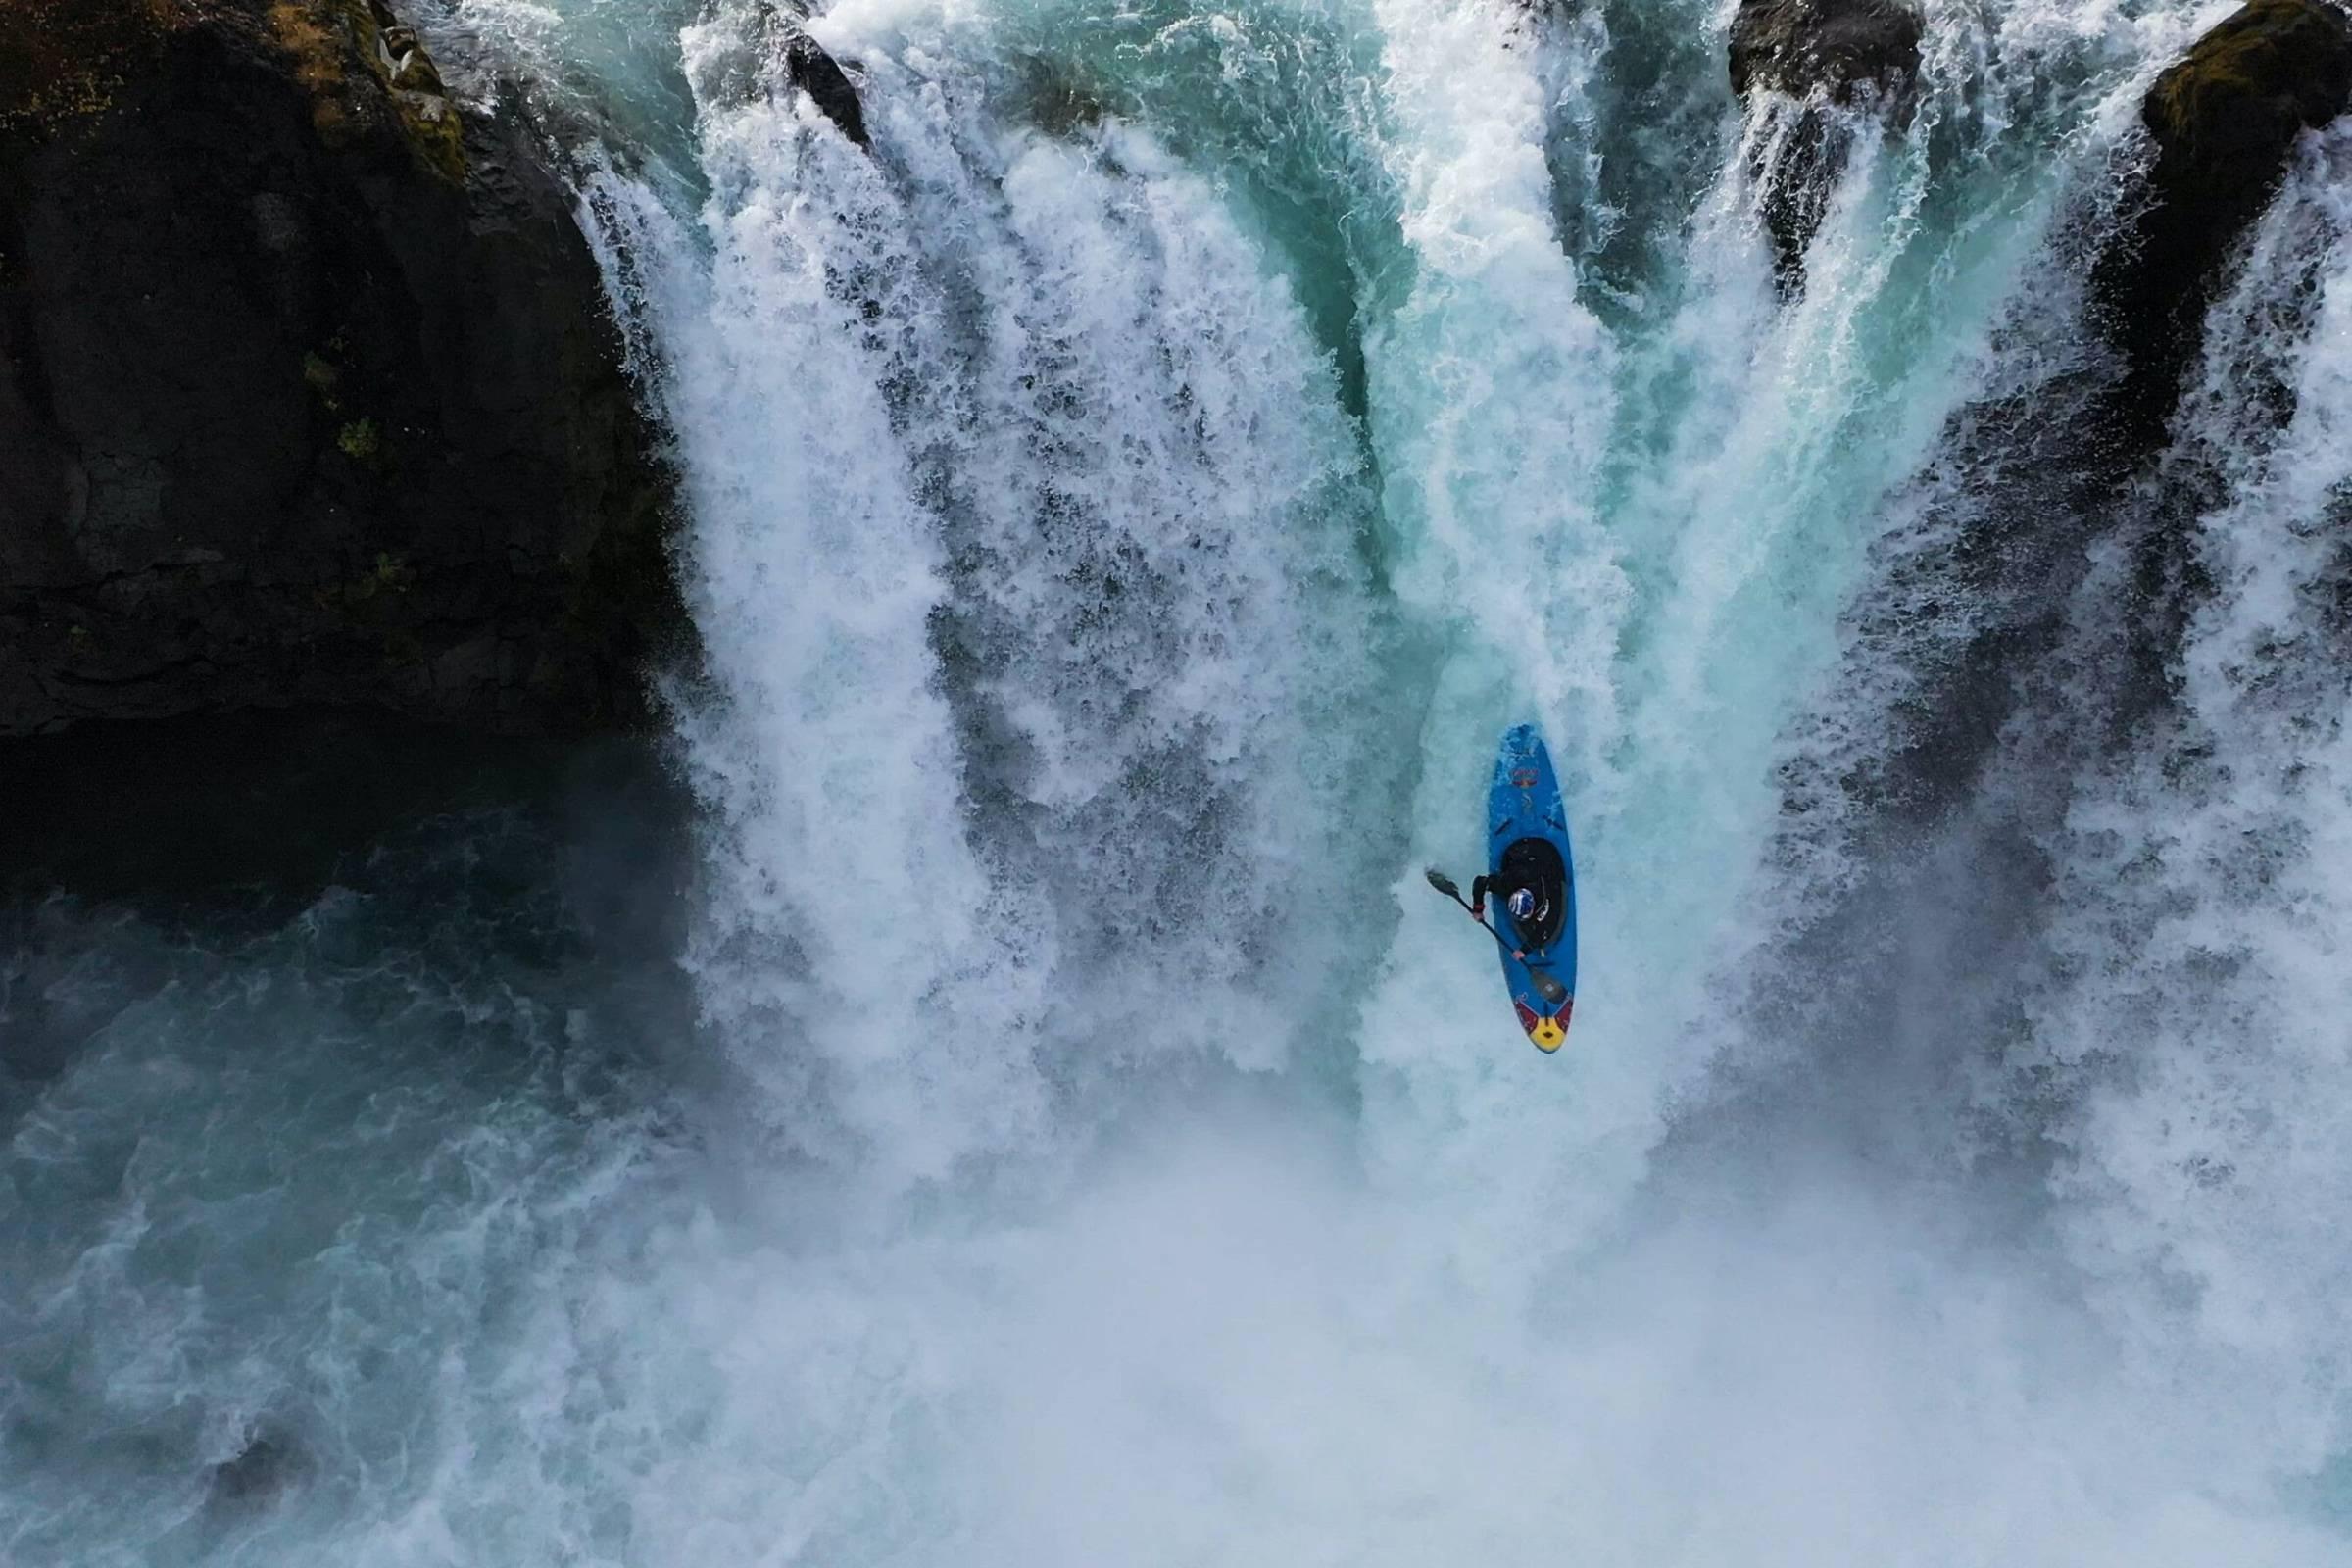 Nouria Nouman in blue kayak going down massive waterfall